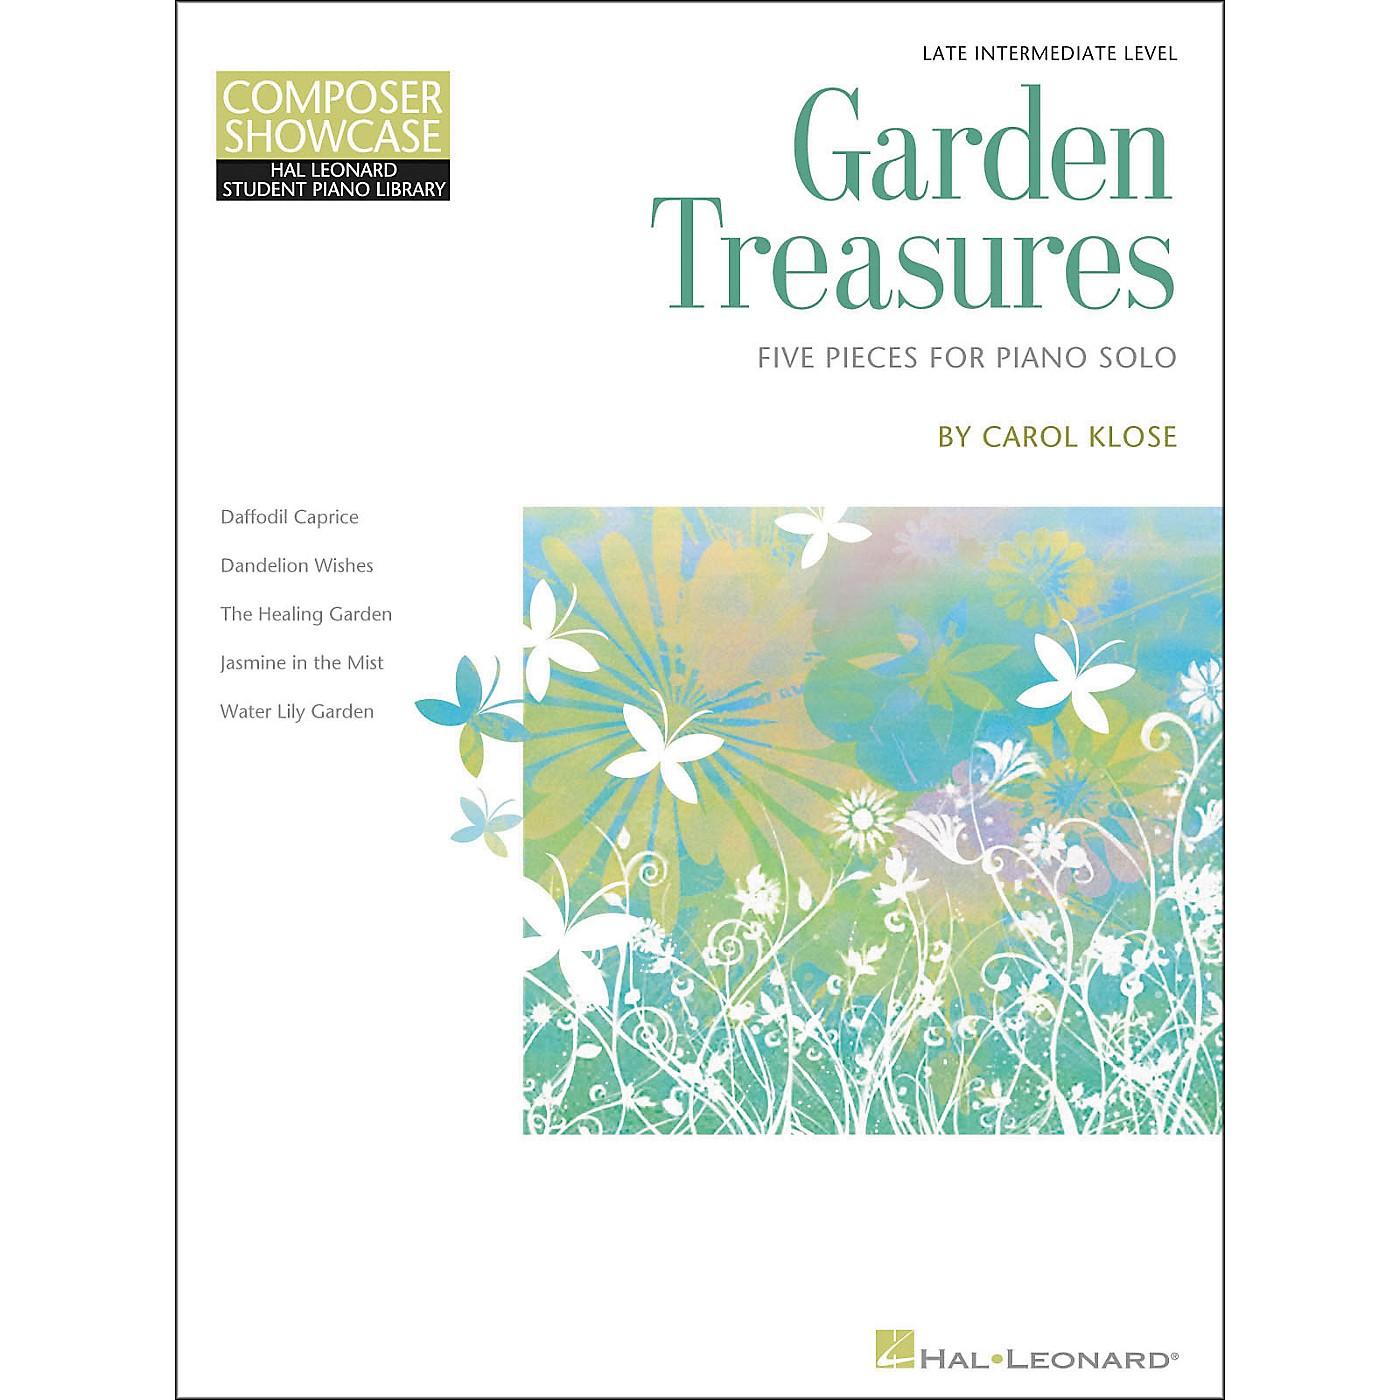 Hal Leonard Garden Treasures - Composer Showcase Intermediate/Late Intermediate Piano Solos Hal Leonard Student Piano Library by Carol Klose thumbnail